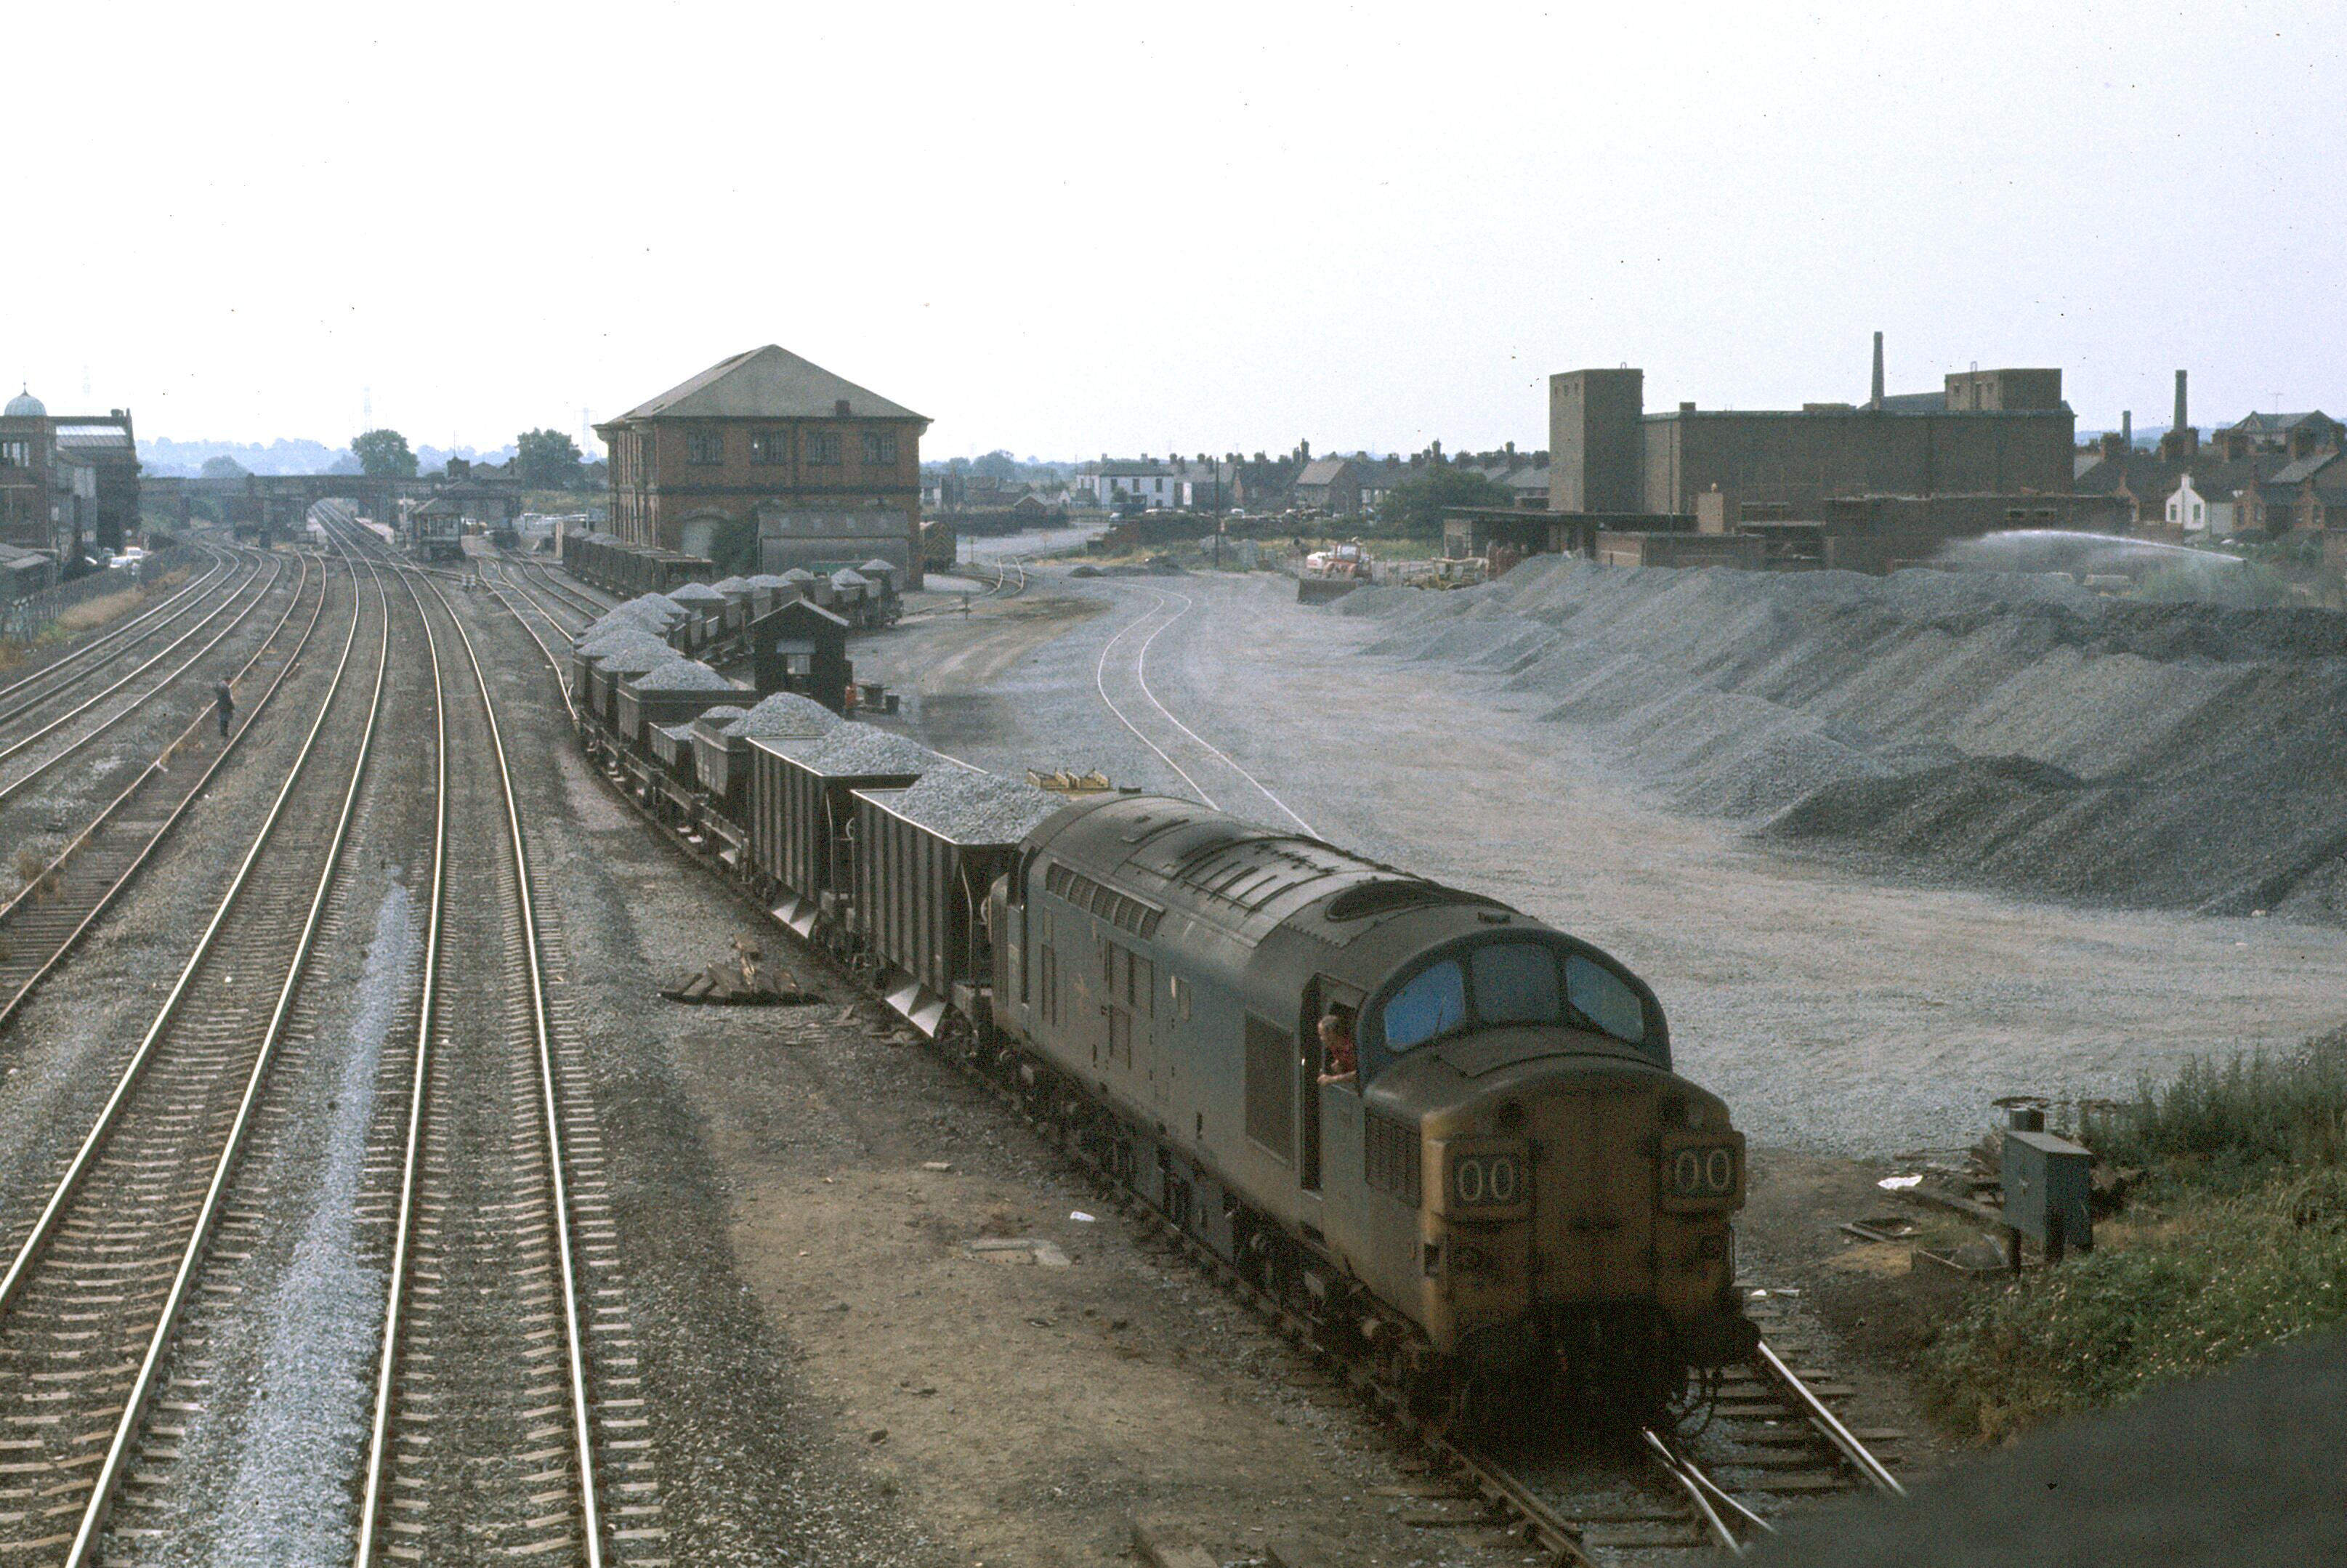 Midland Railway. Loughborough Midland Railway Station Photo 3